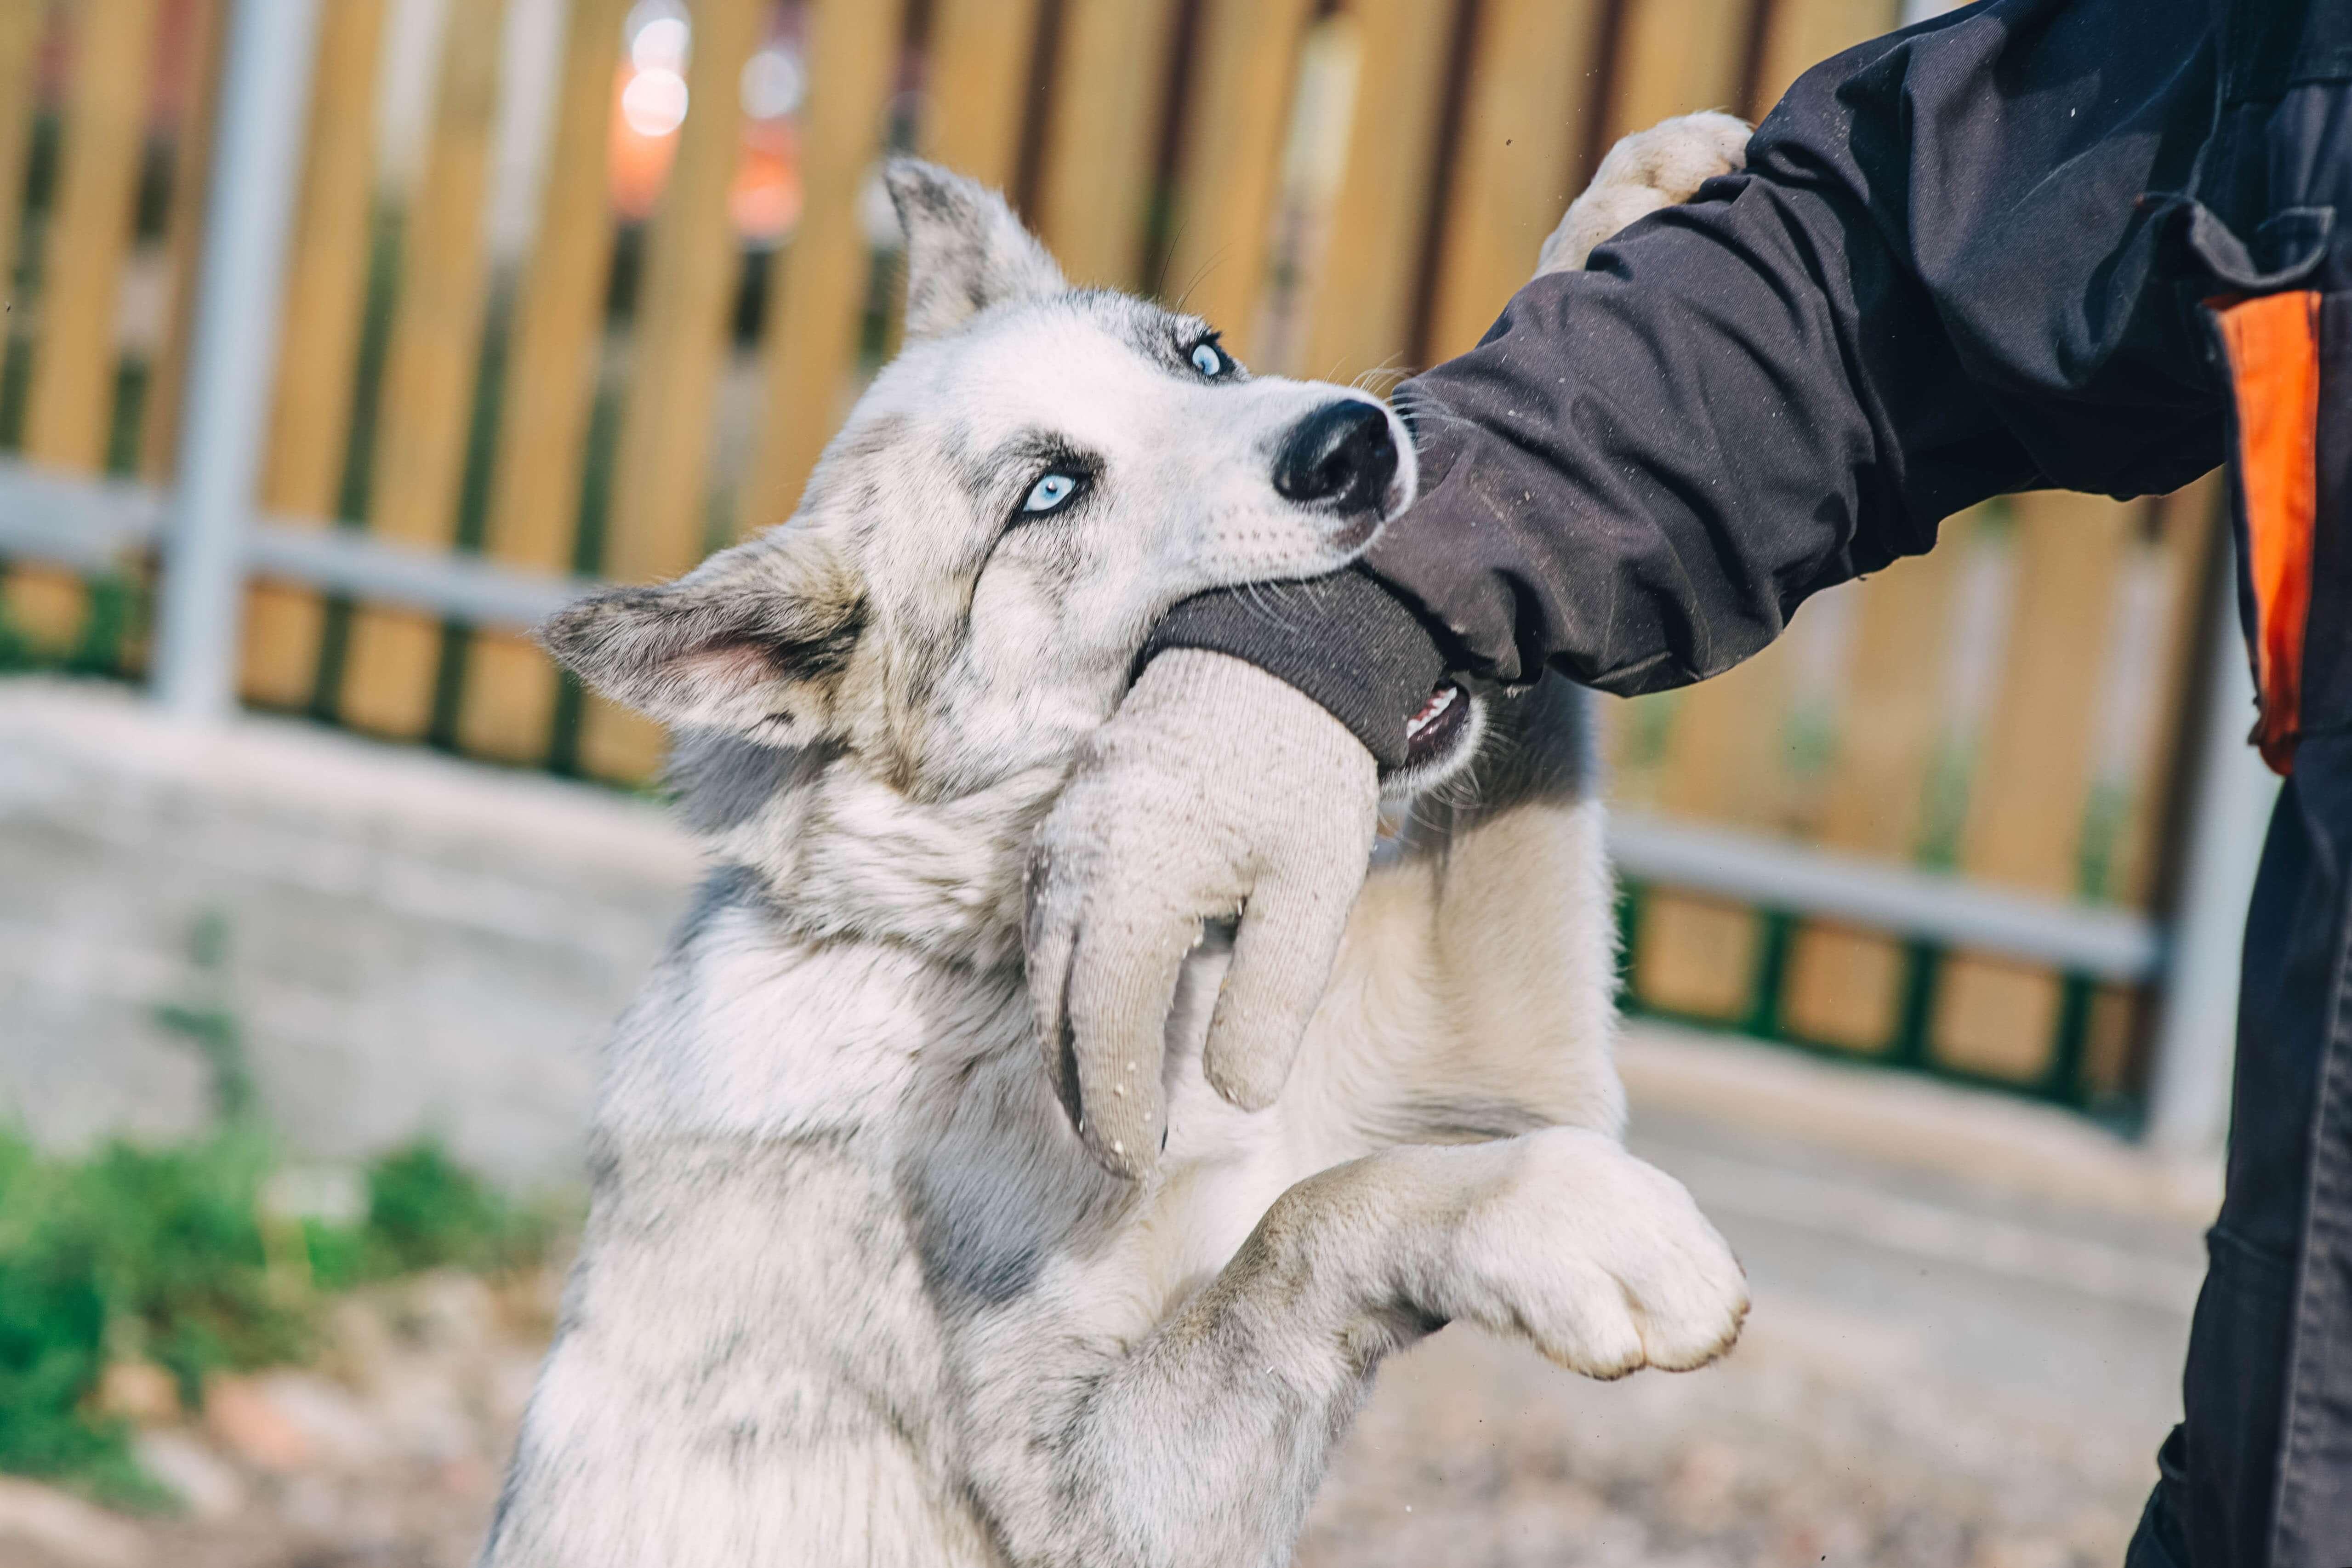 A dog bites a stranger's arm in Indiana.